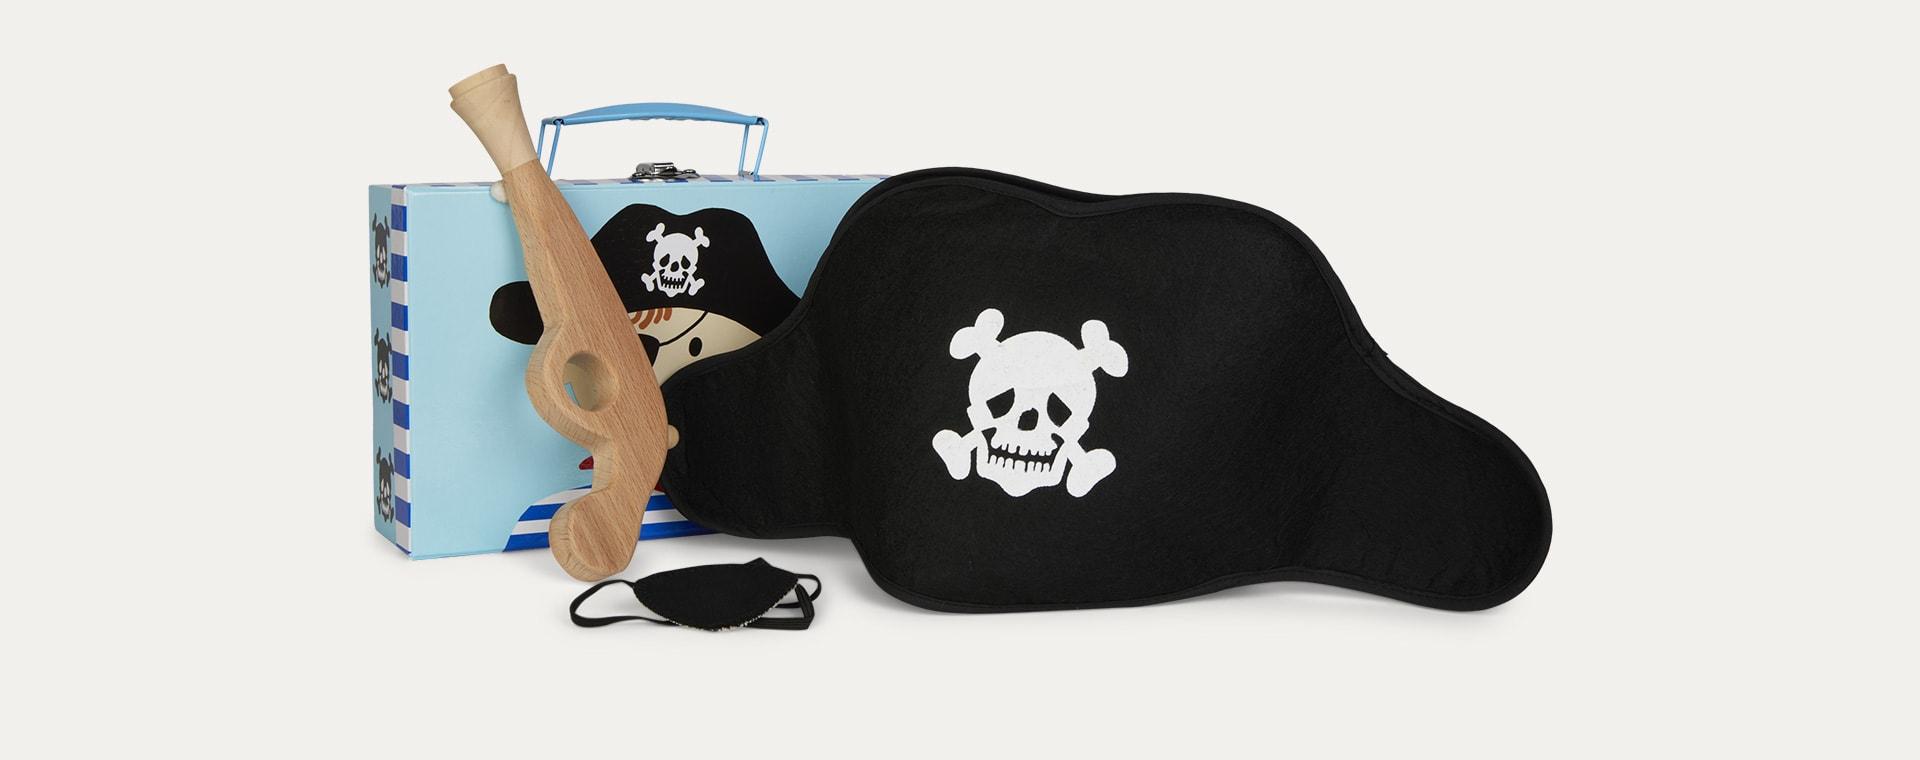 Multi Jabadabado Pirate Bag